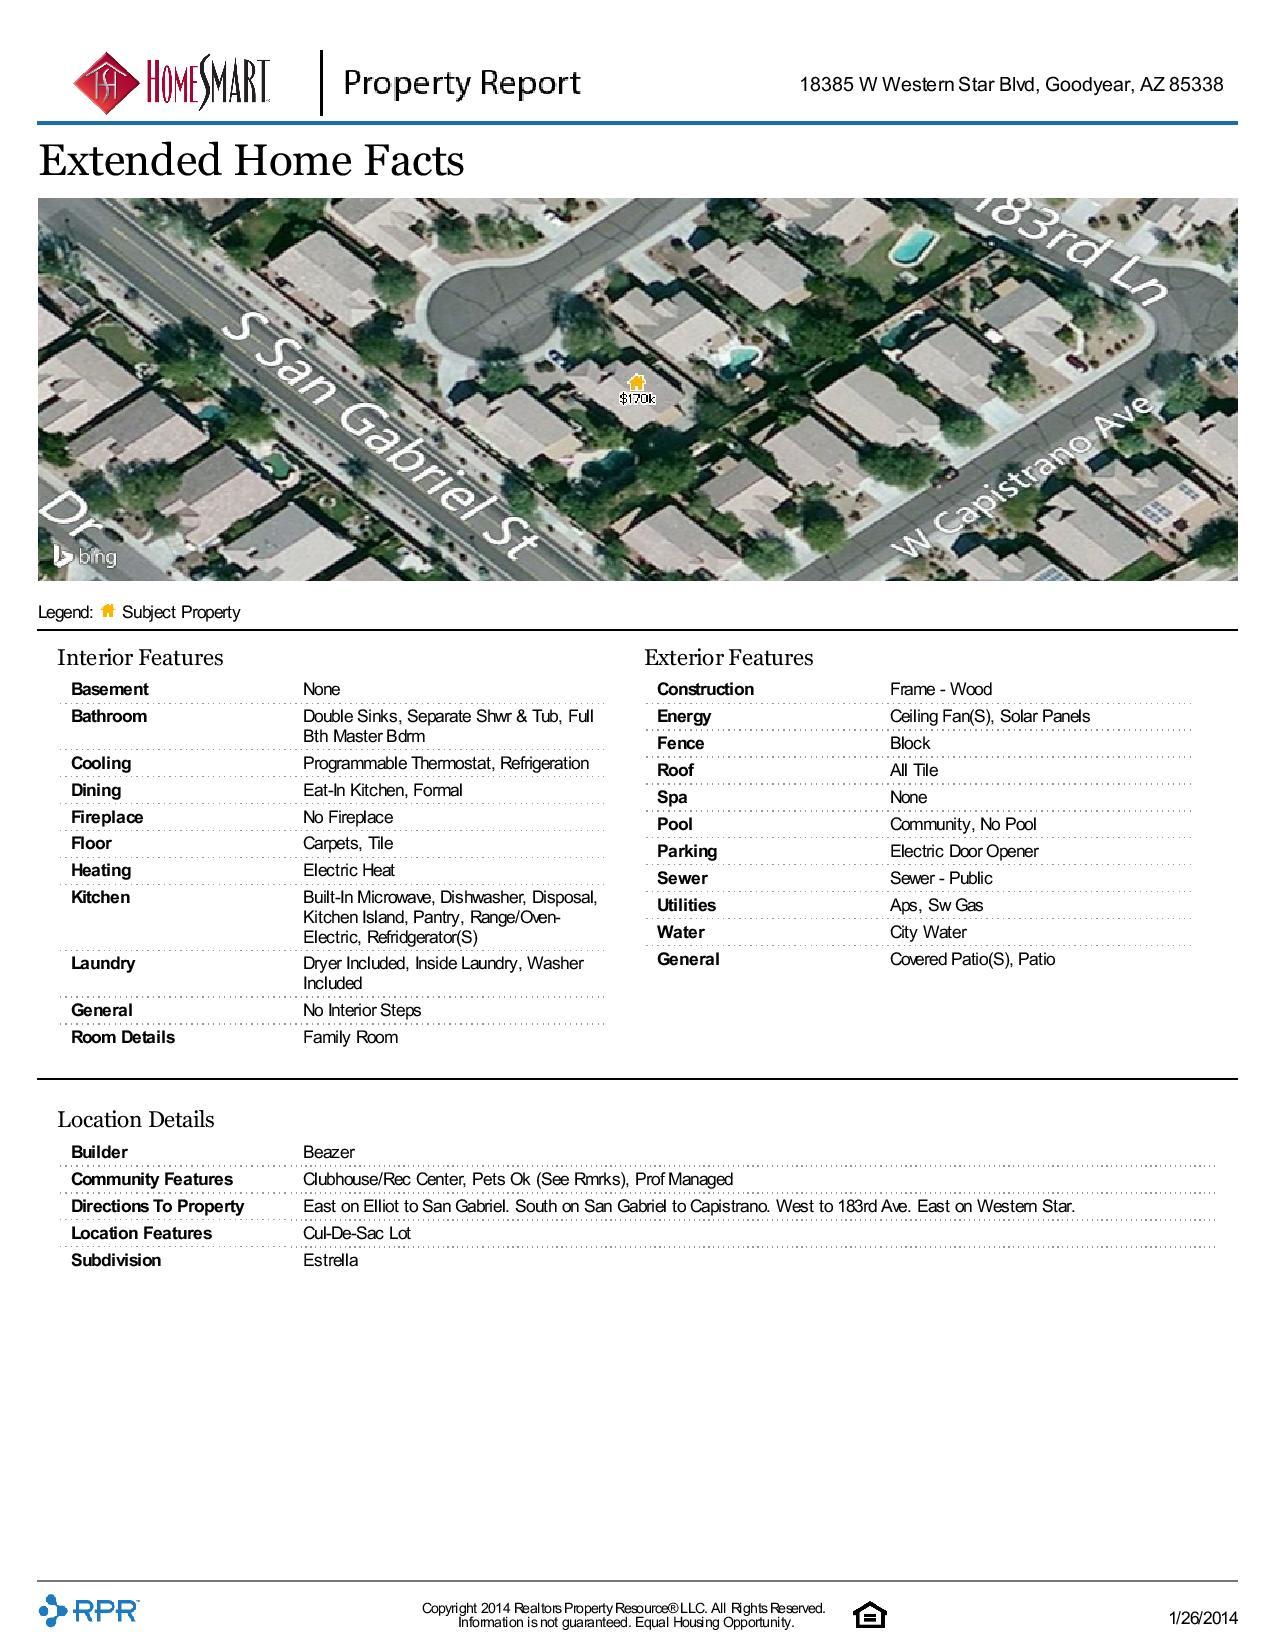 18385-W-Western-Star-Blvd-Goodyear-AZ-85338.pdf-page-004